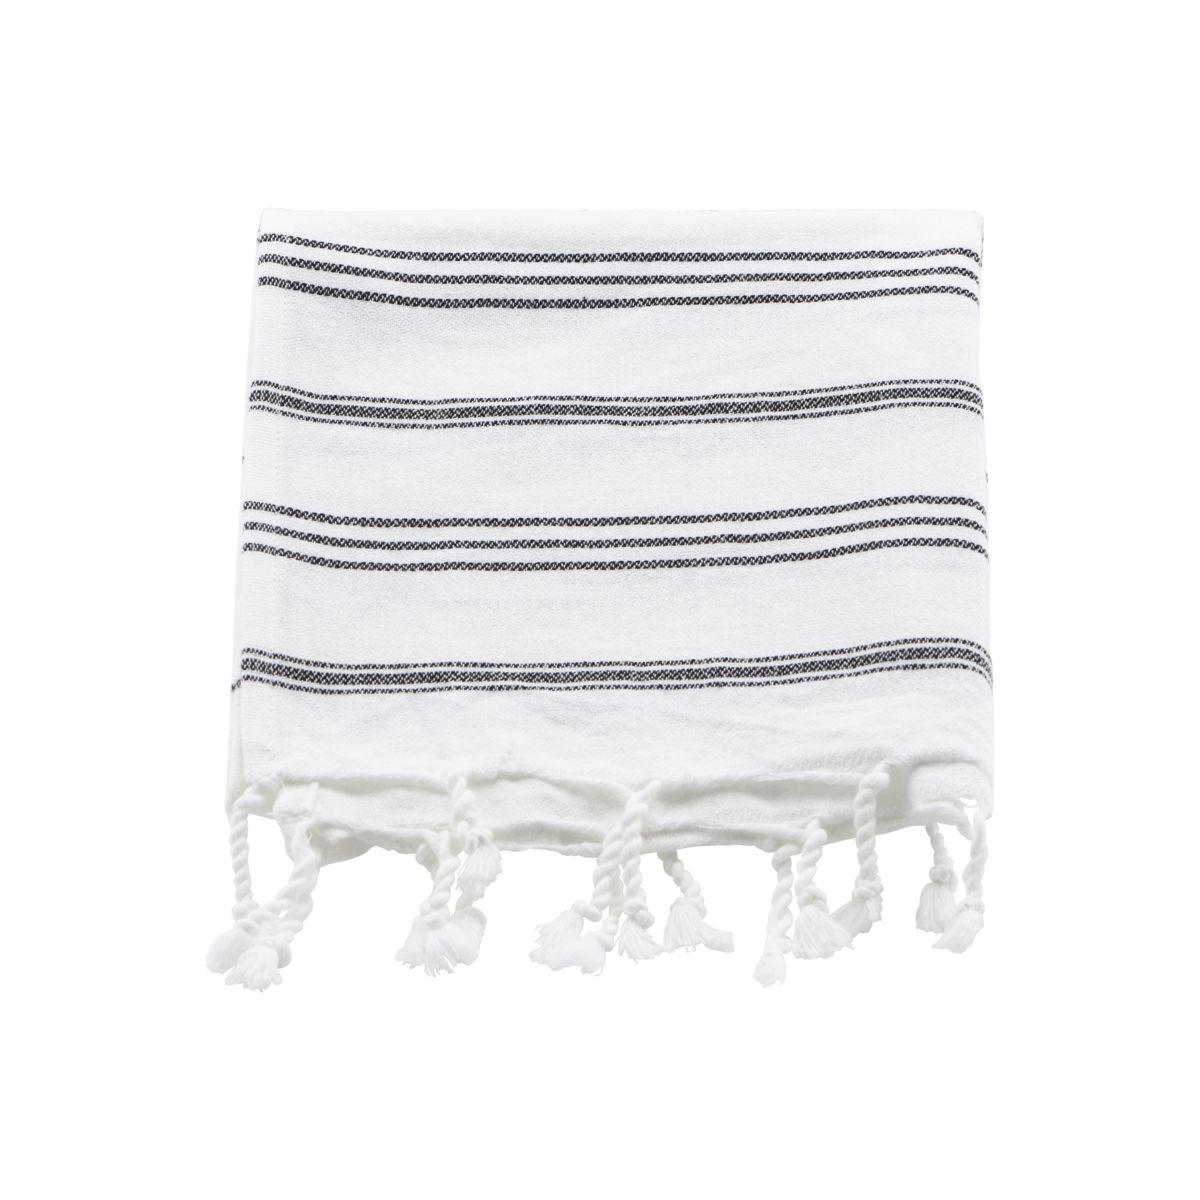 Image of   Meraki Hammam håndklæde, Hvid m. sort stribe, l: 90 cm, b: 45 cm